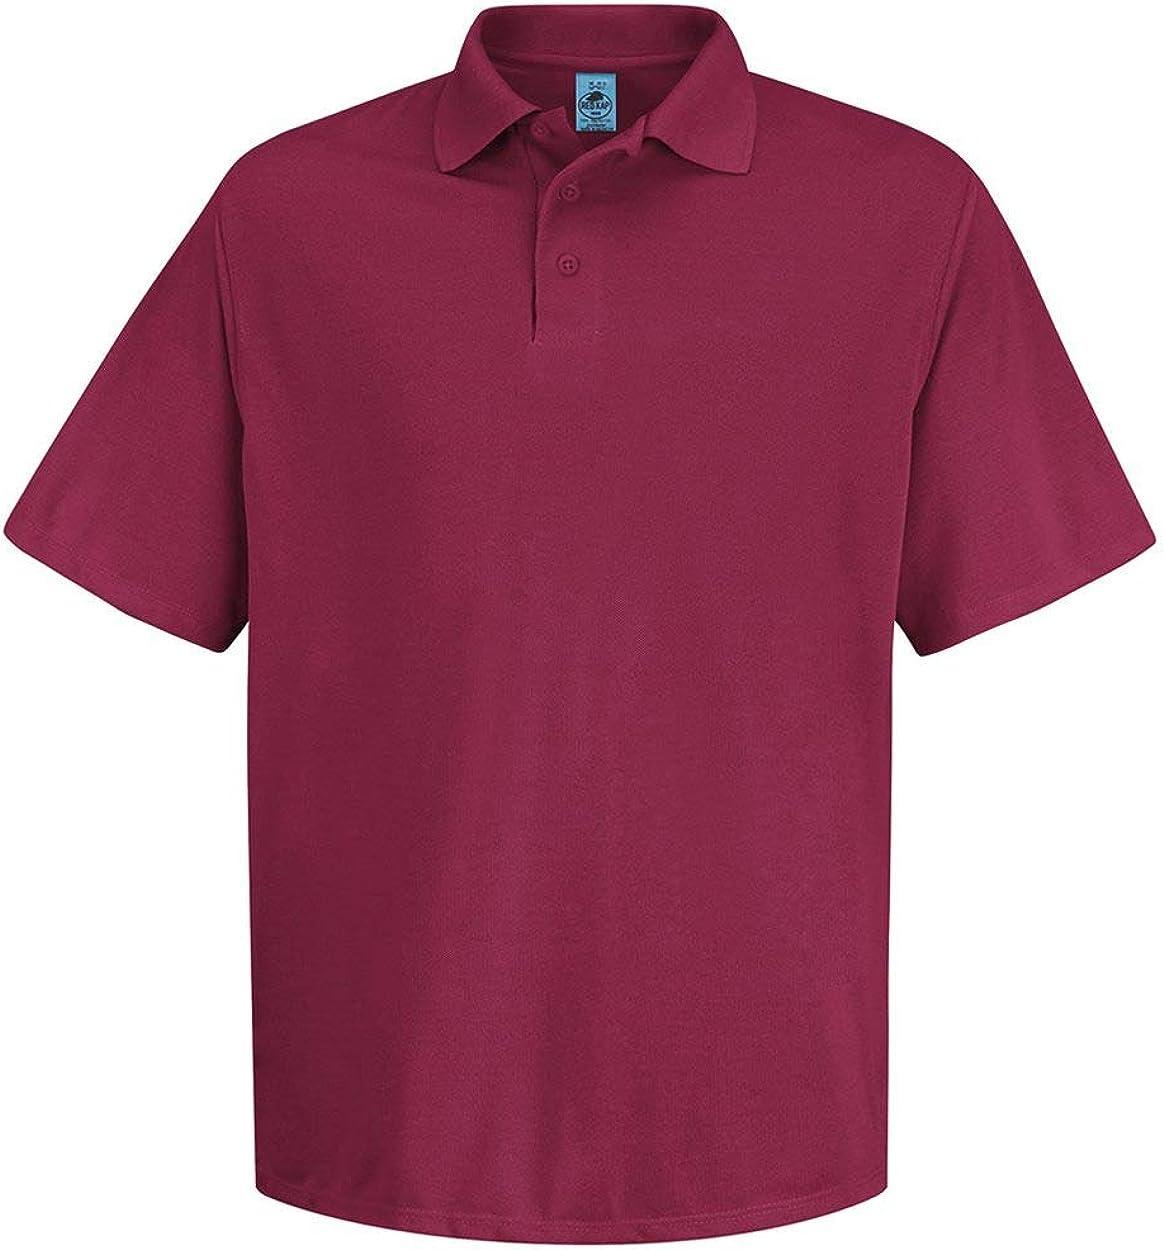 Red Kap Men's Big Short Sleeve no Pocket Polo Shirt, White, 2X-Large